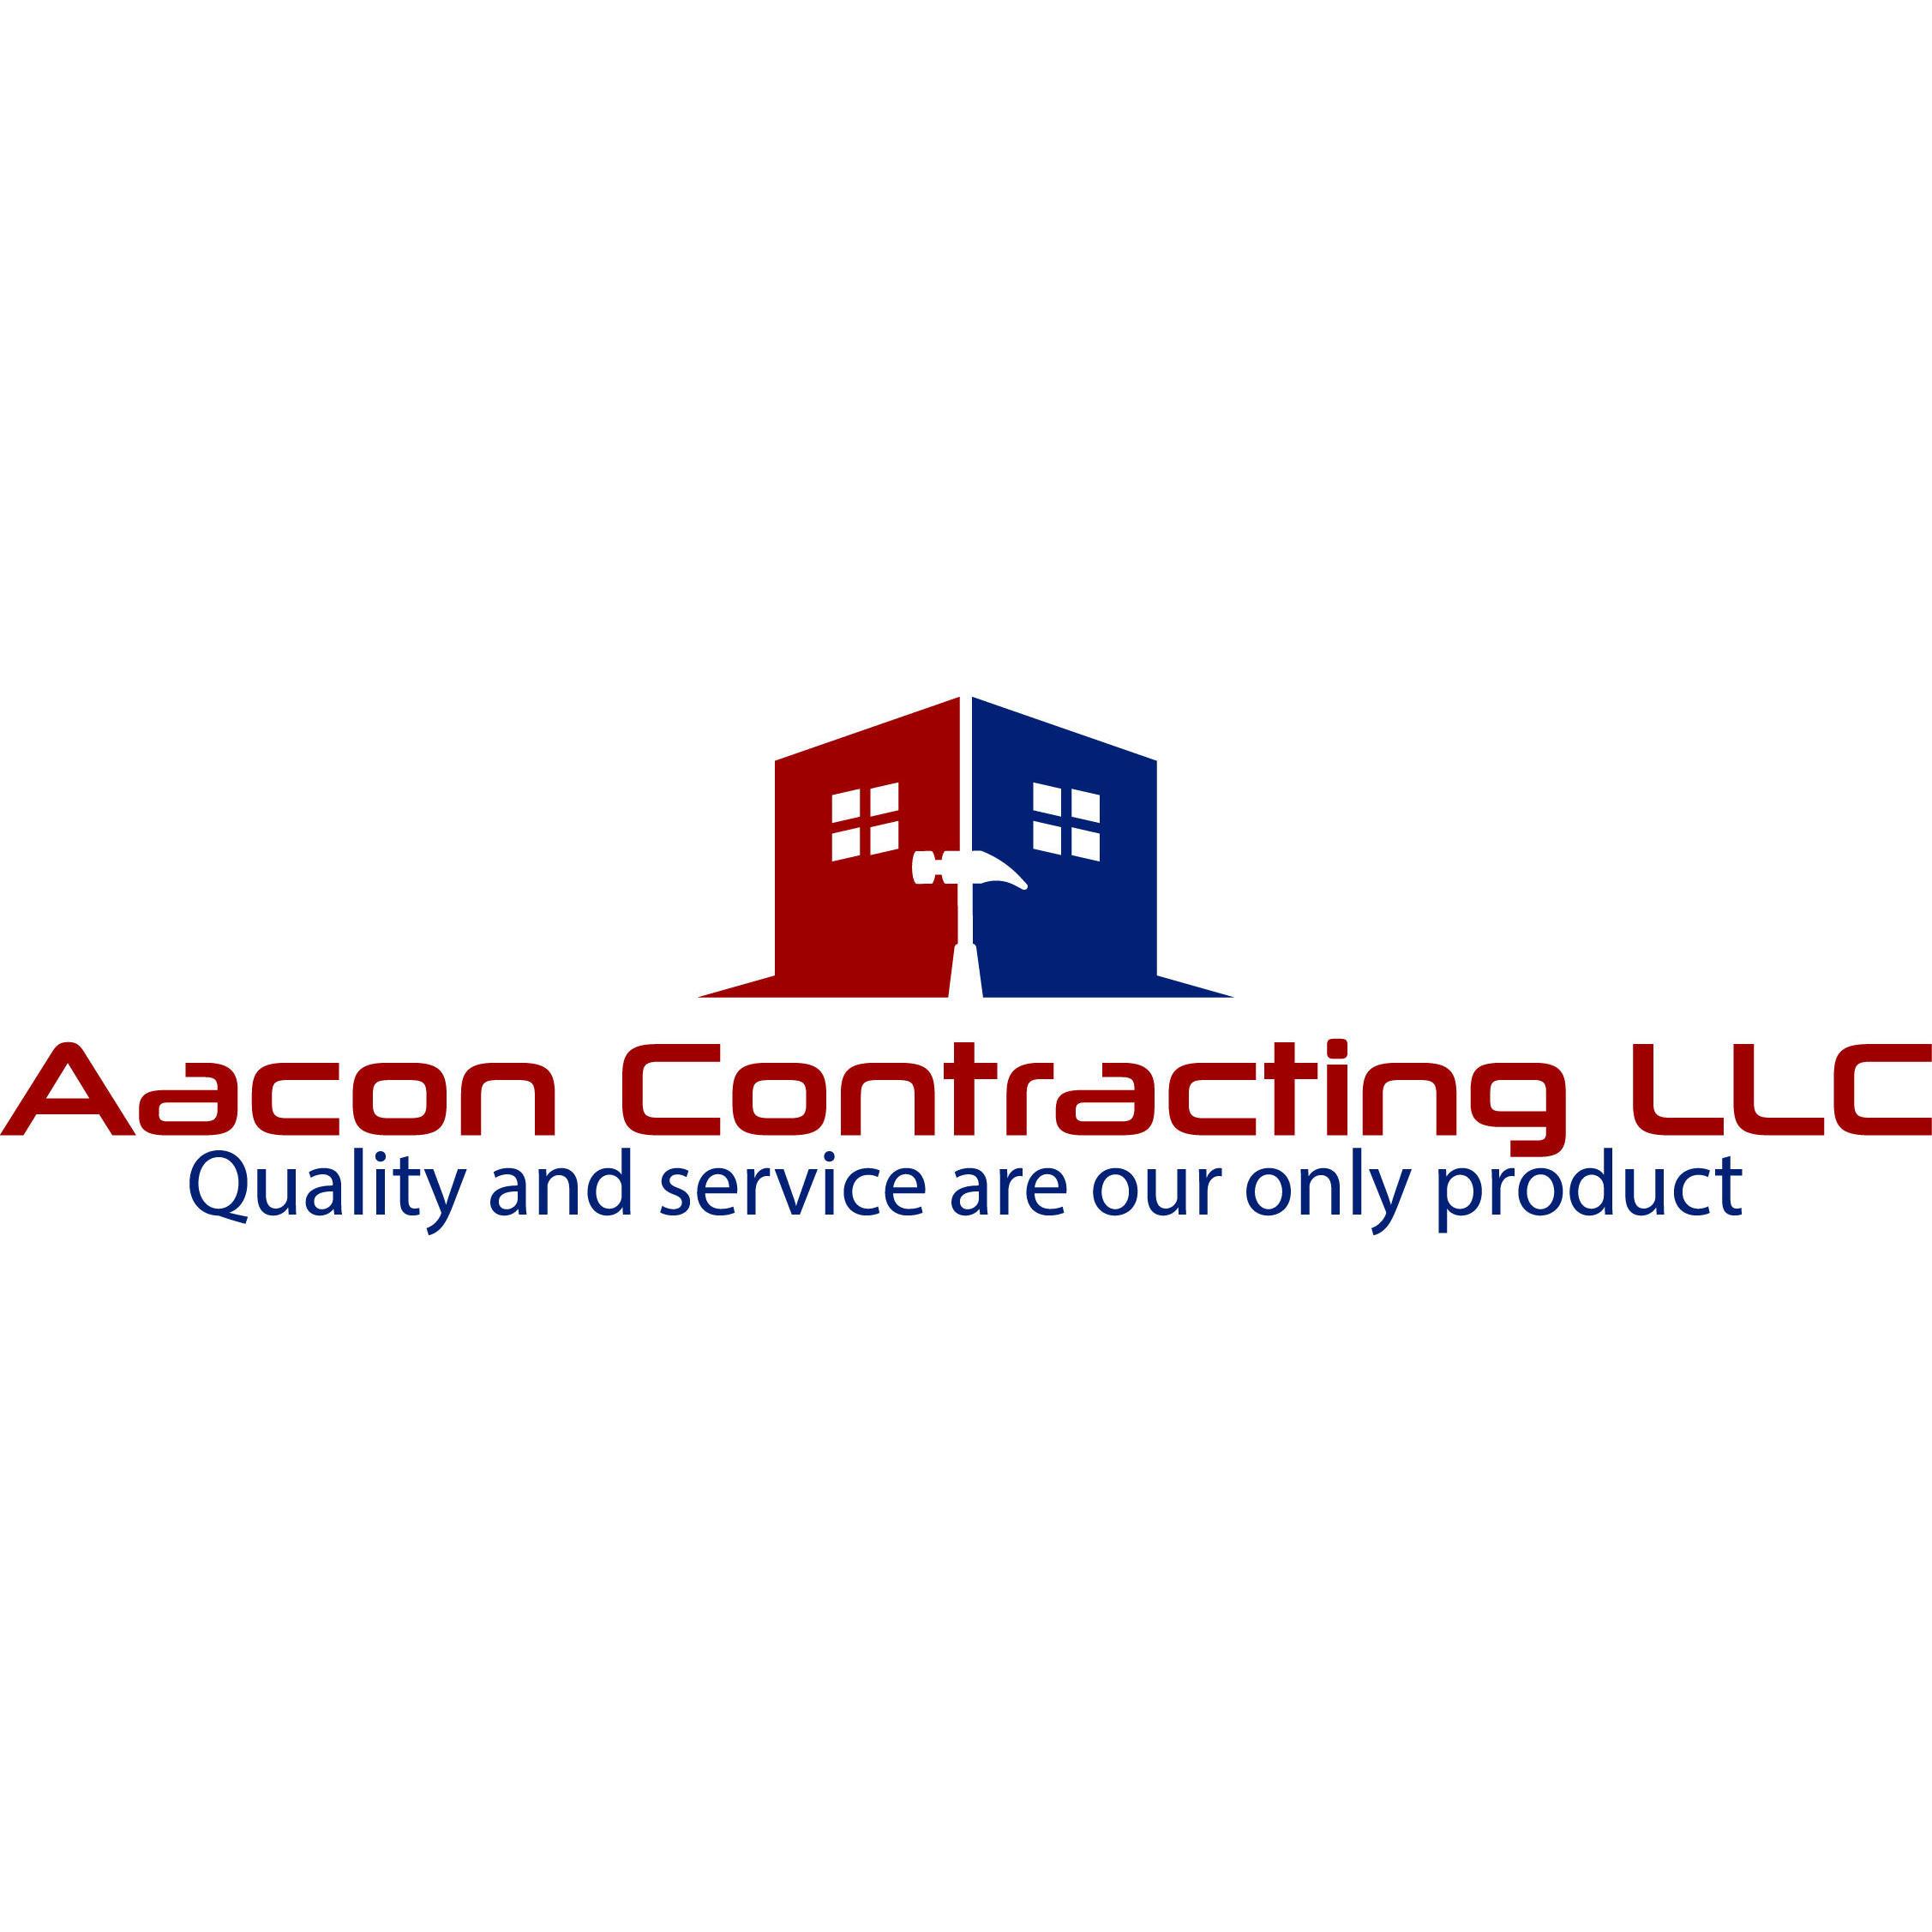 Aacon Contracting, LLC